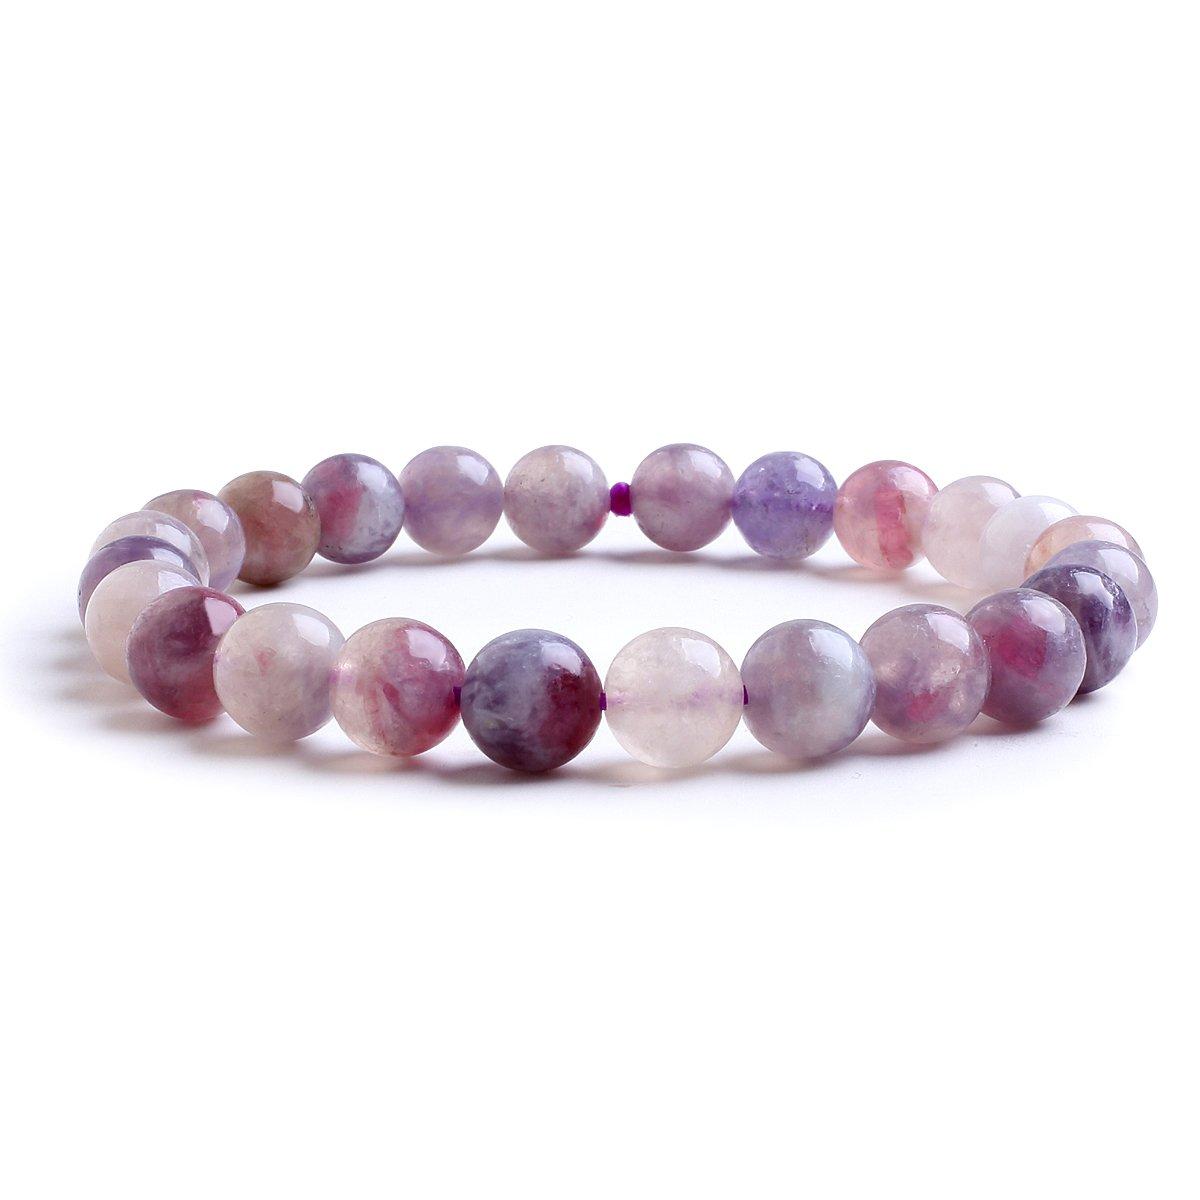 8mm Natural Stone Healing Elastic Beaded Stretch Bracelet Birthstone For 6 - 7.5 Inch Wrist Unisex Candyfancy B040